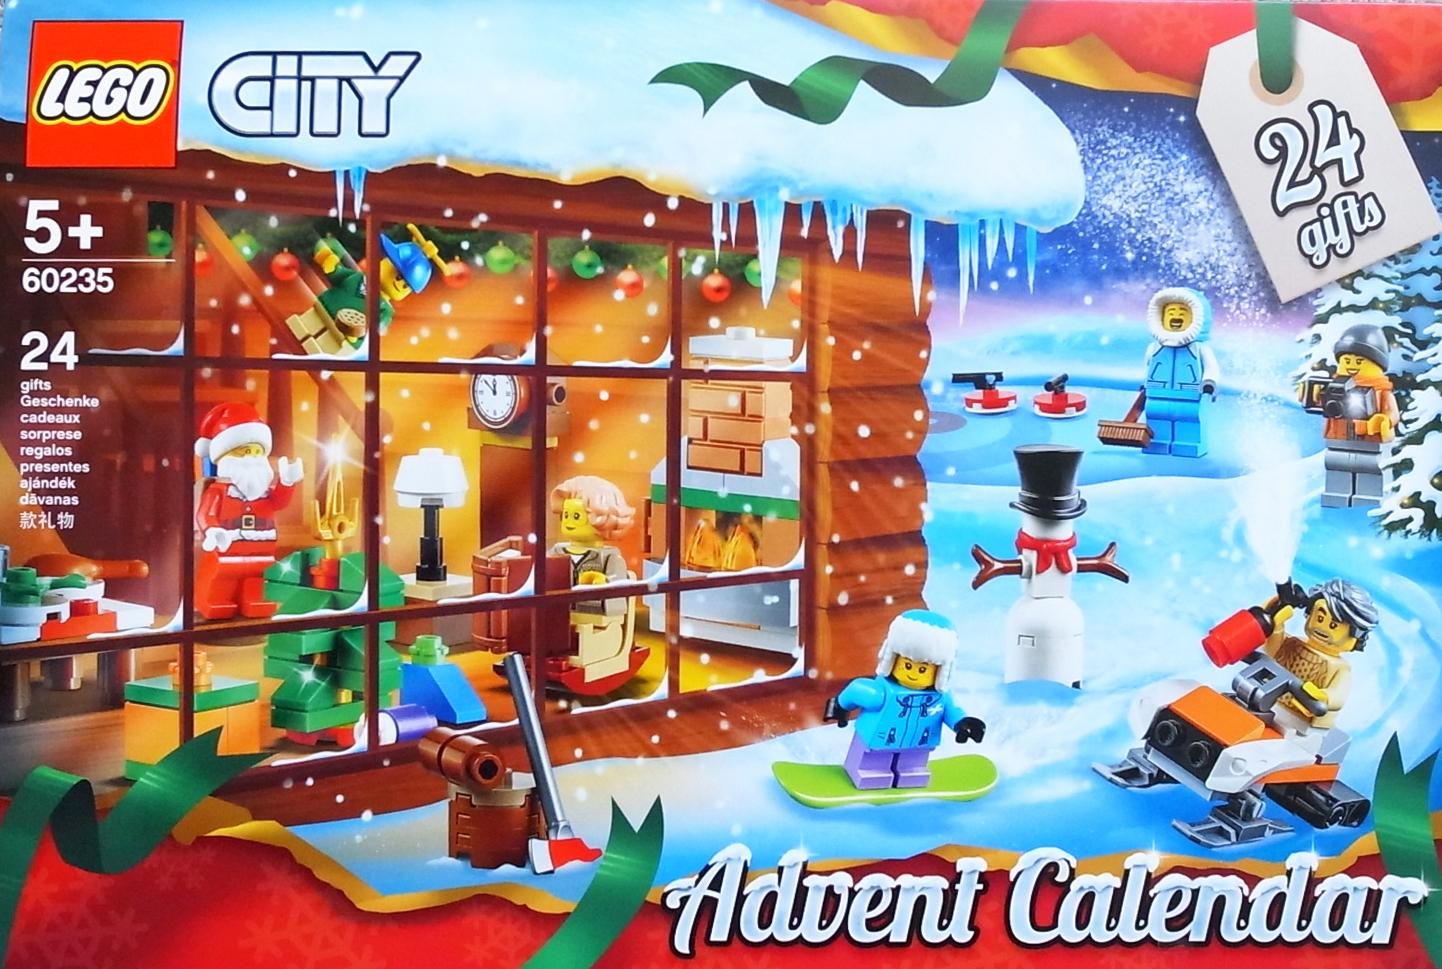 LEGO (レゴ) アドベント カレンダー Advent Calendar